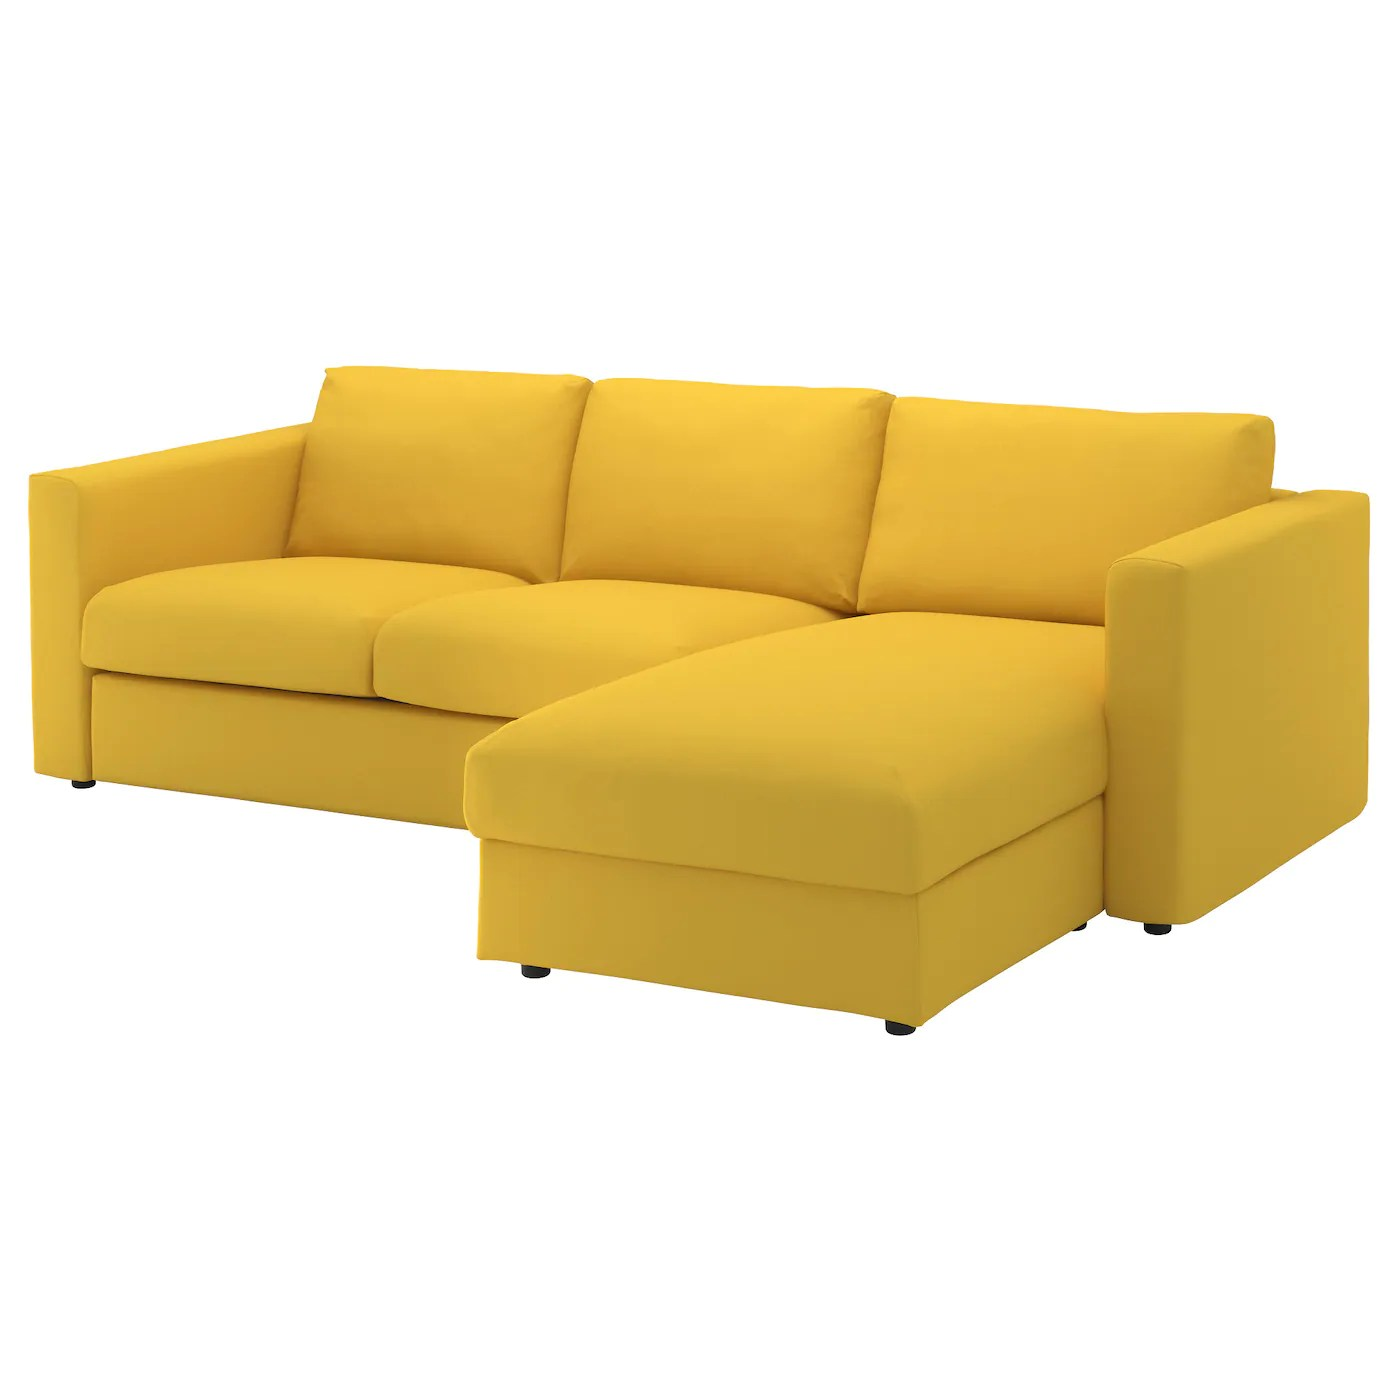 Three Seater Chaise Sofa